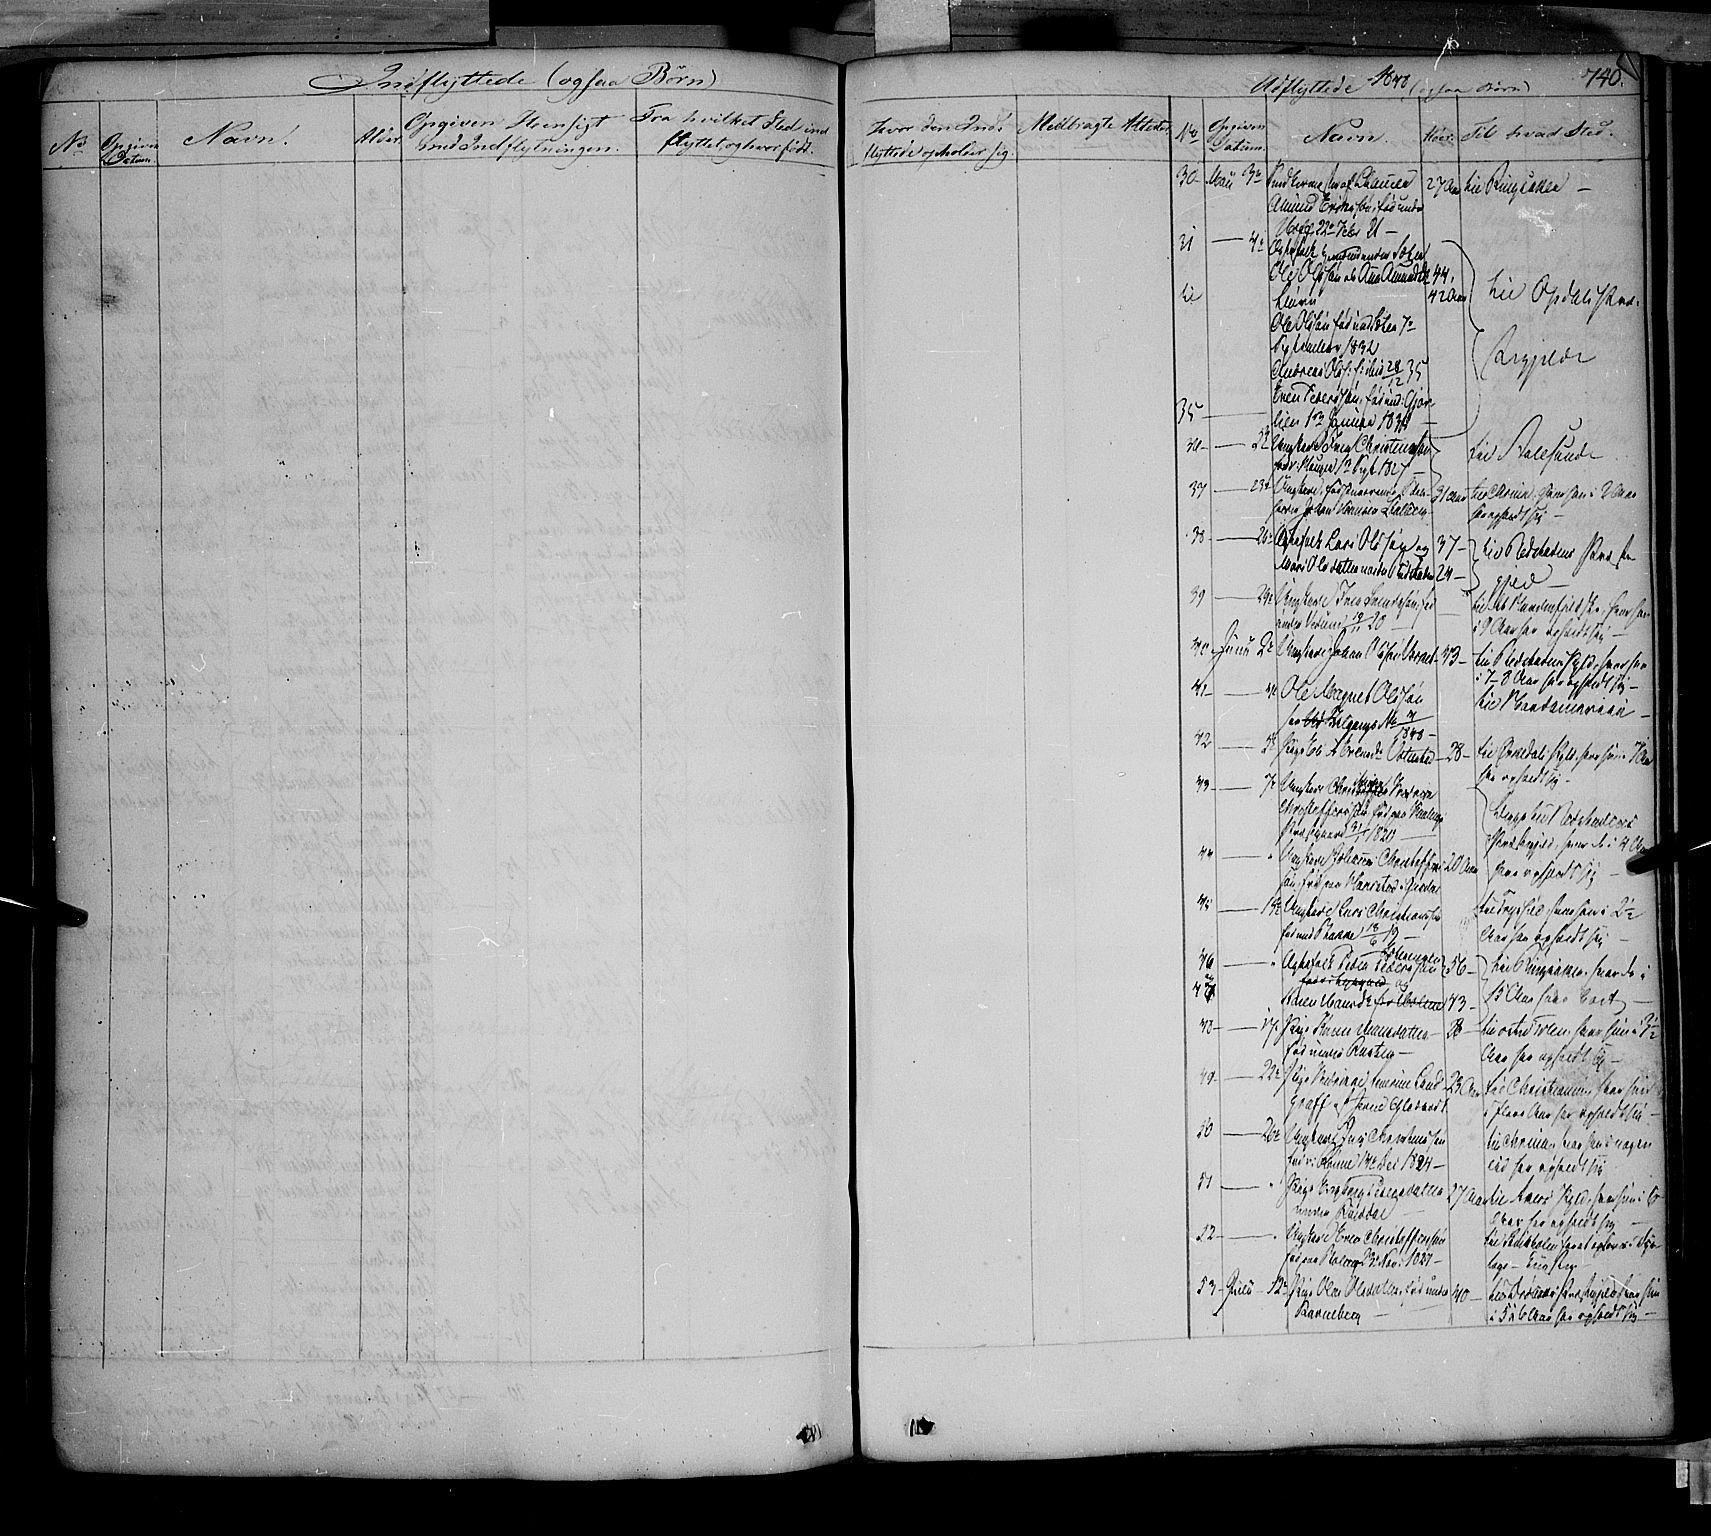 SAH, Fåberg prestekontor, Ministerialbok nr. 5, 1836-1854, s. 739-740